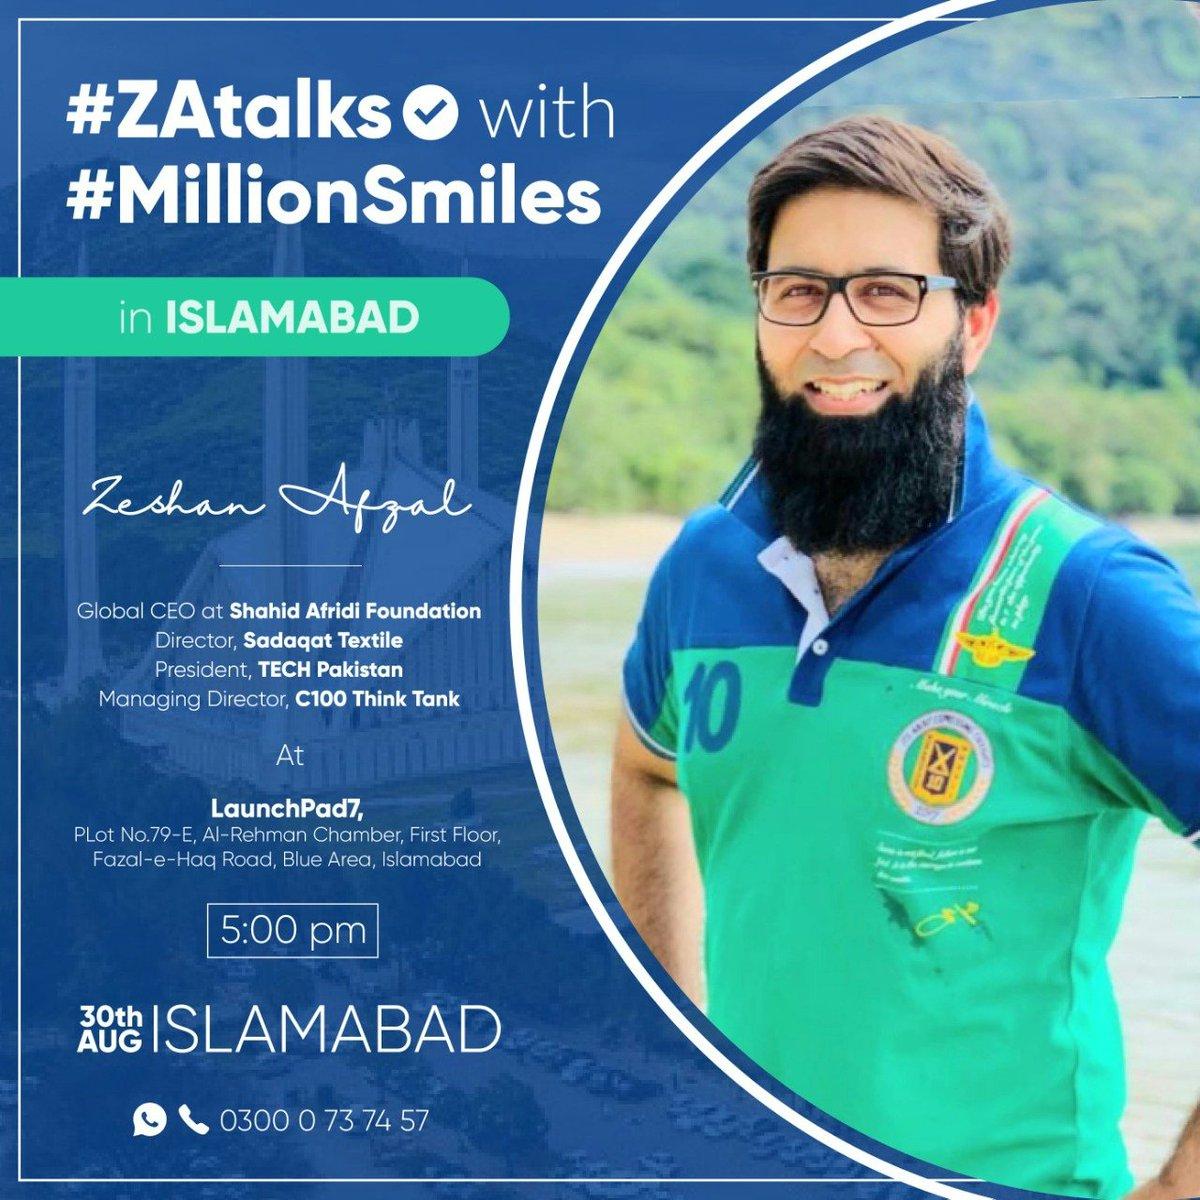 Zeshan Afzal ذیشان افضل (@ZAtalks) | Twitter